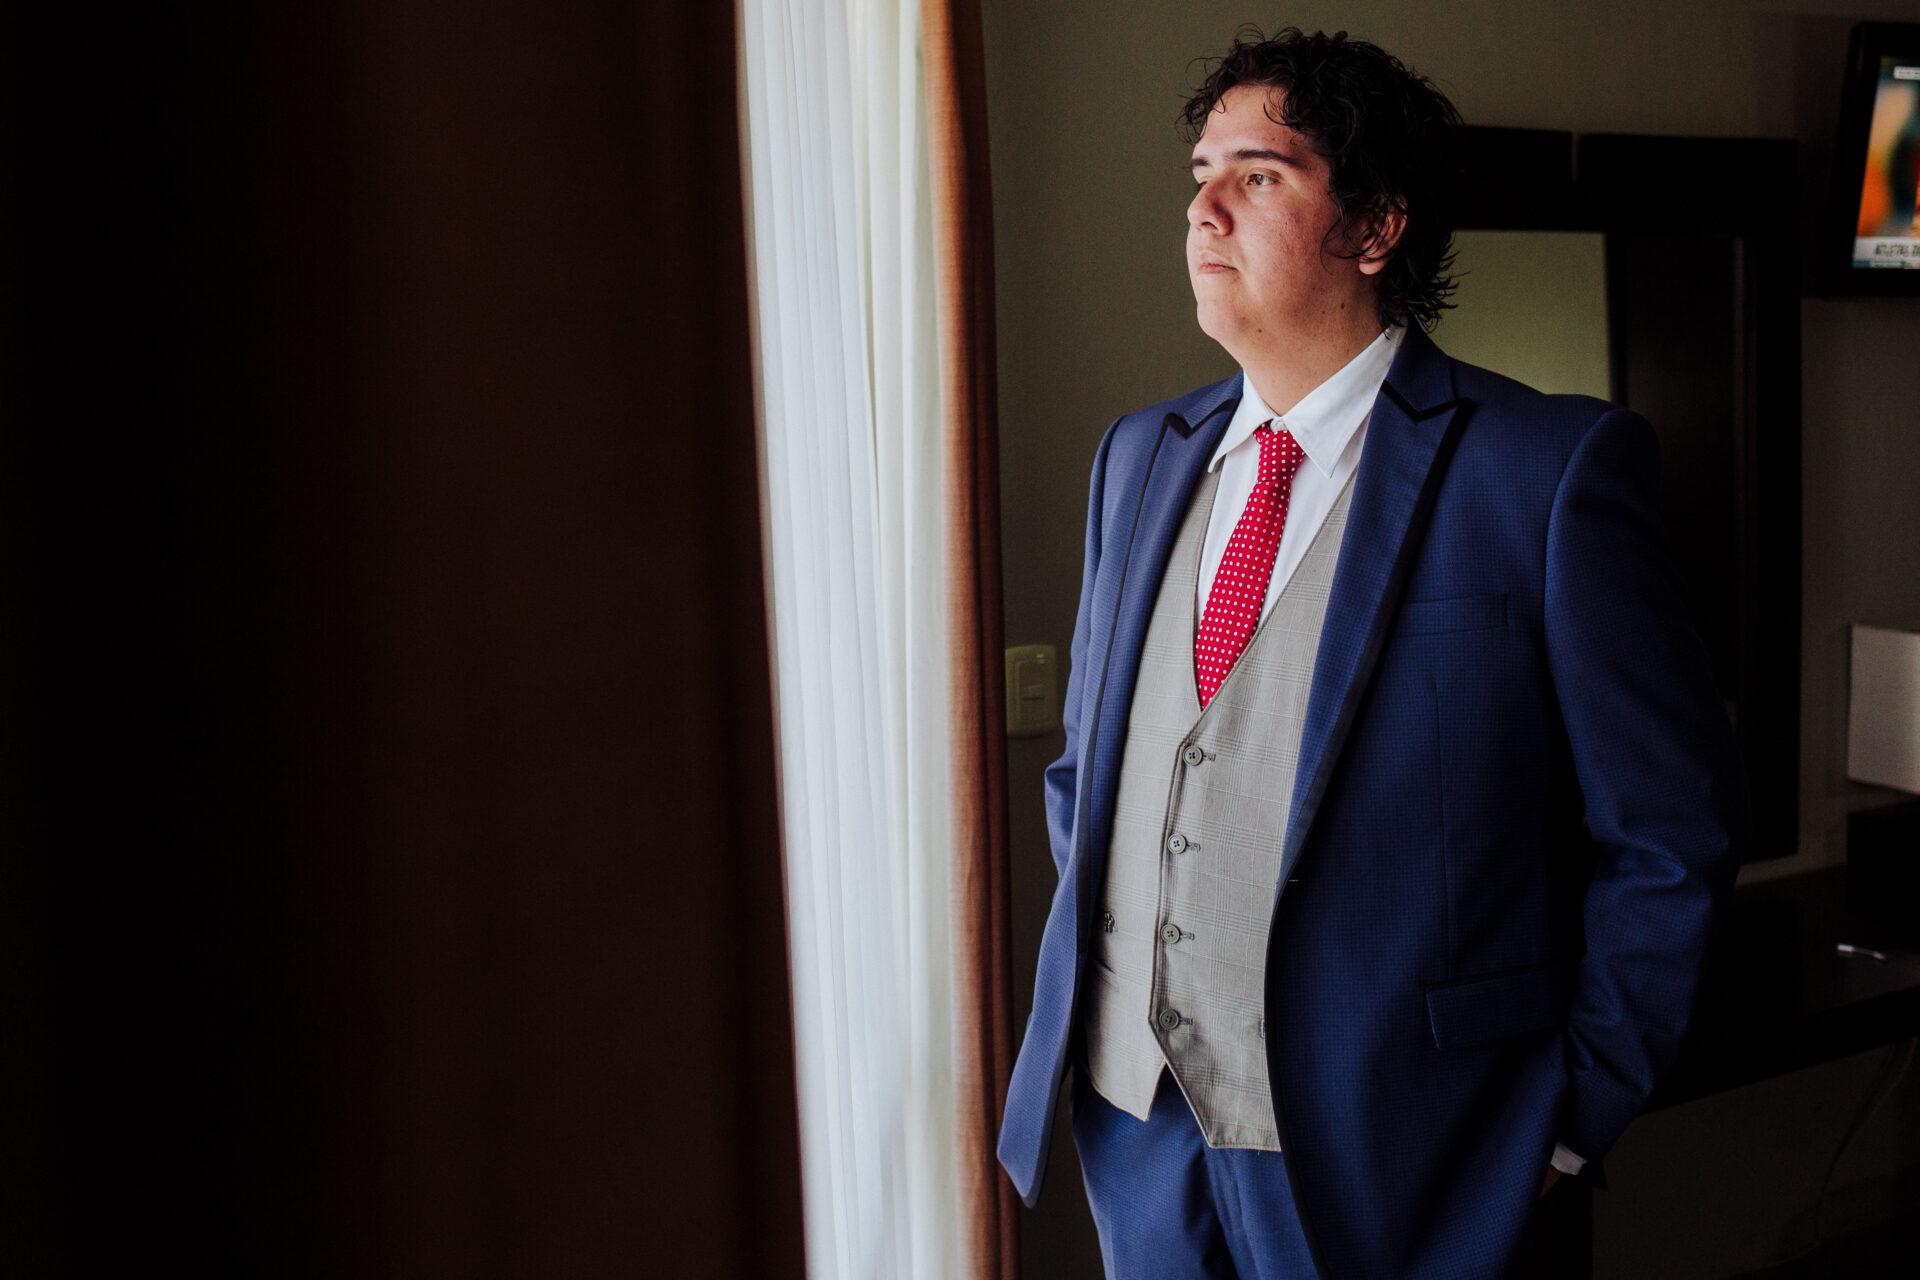 javier_noriega_fotografo_bodas_gaviones_zacatecas_wedding_photographer9